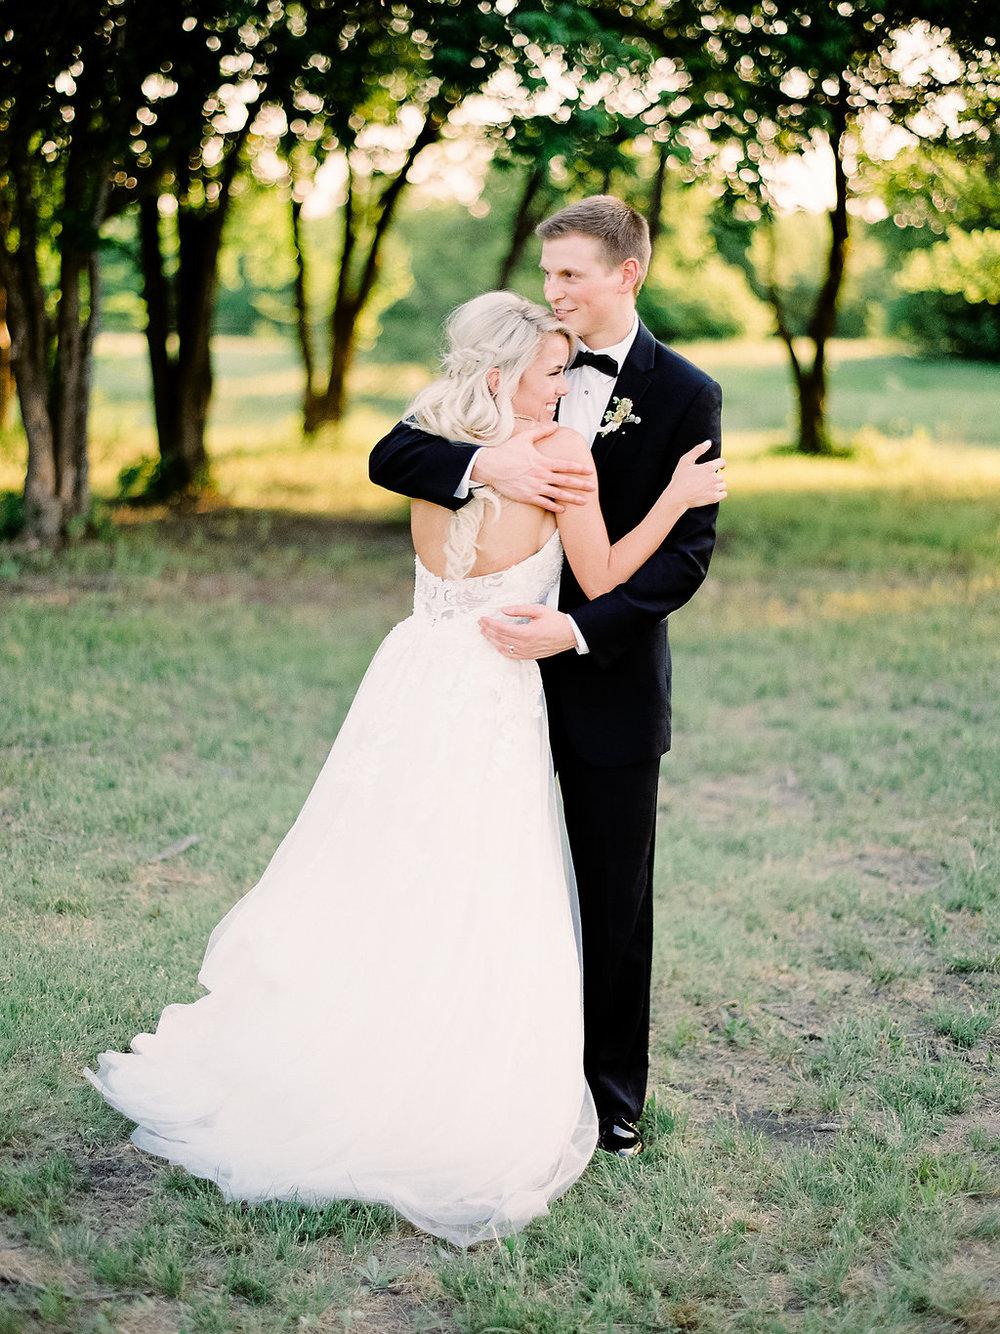 Best-Austin-Denver-California-Wedding-Photographer-Nest-Ruth-Farms-44.jpg